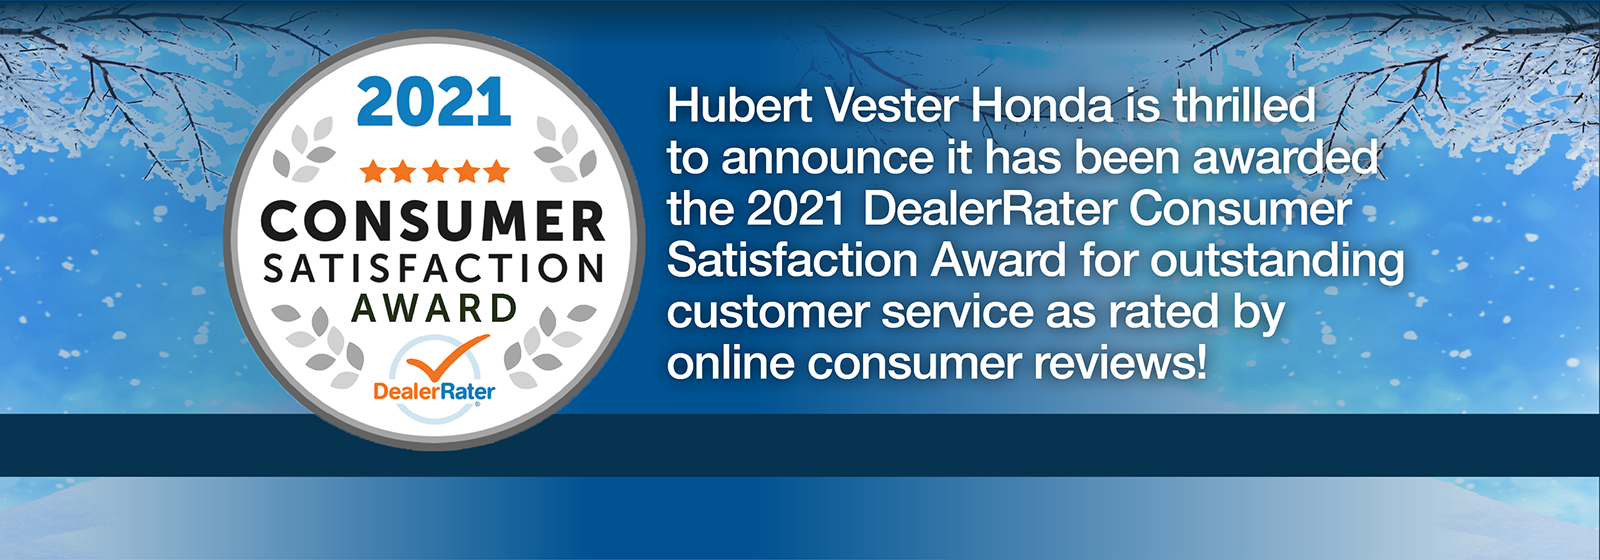 HVH-170 Consumer Satisfaction Award Slide 1600×560